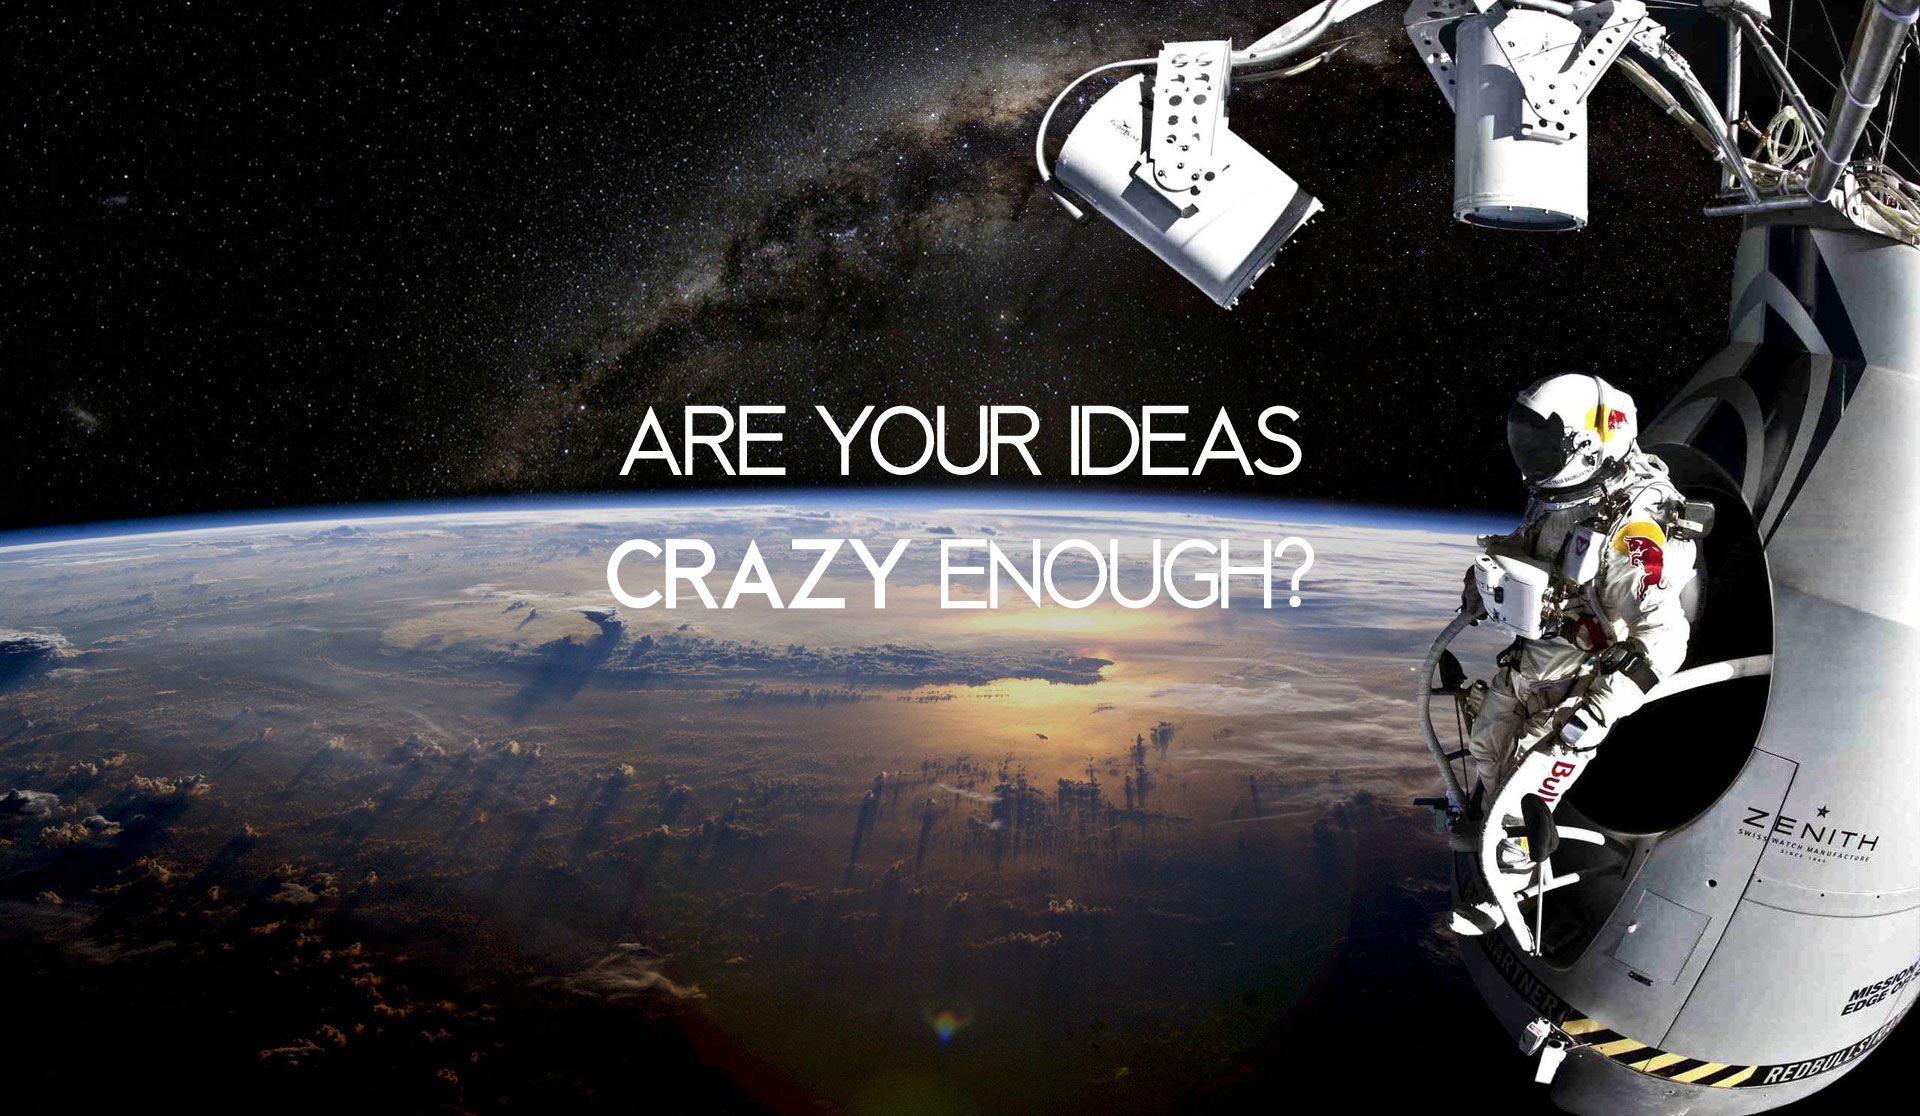 Are your ideas crazy enough?